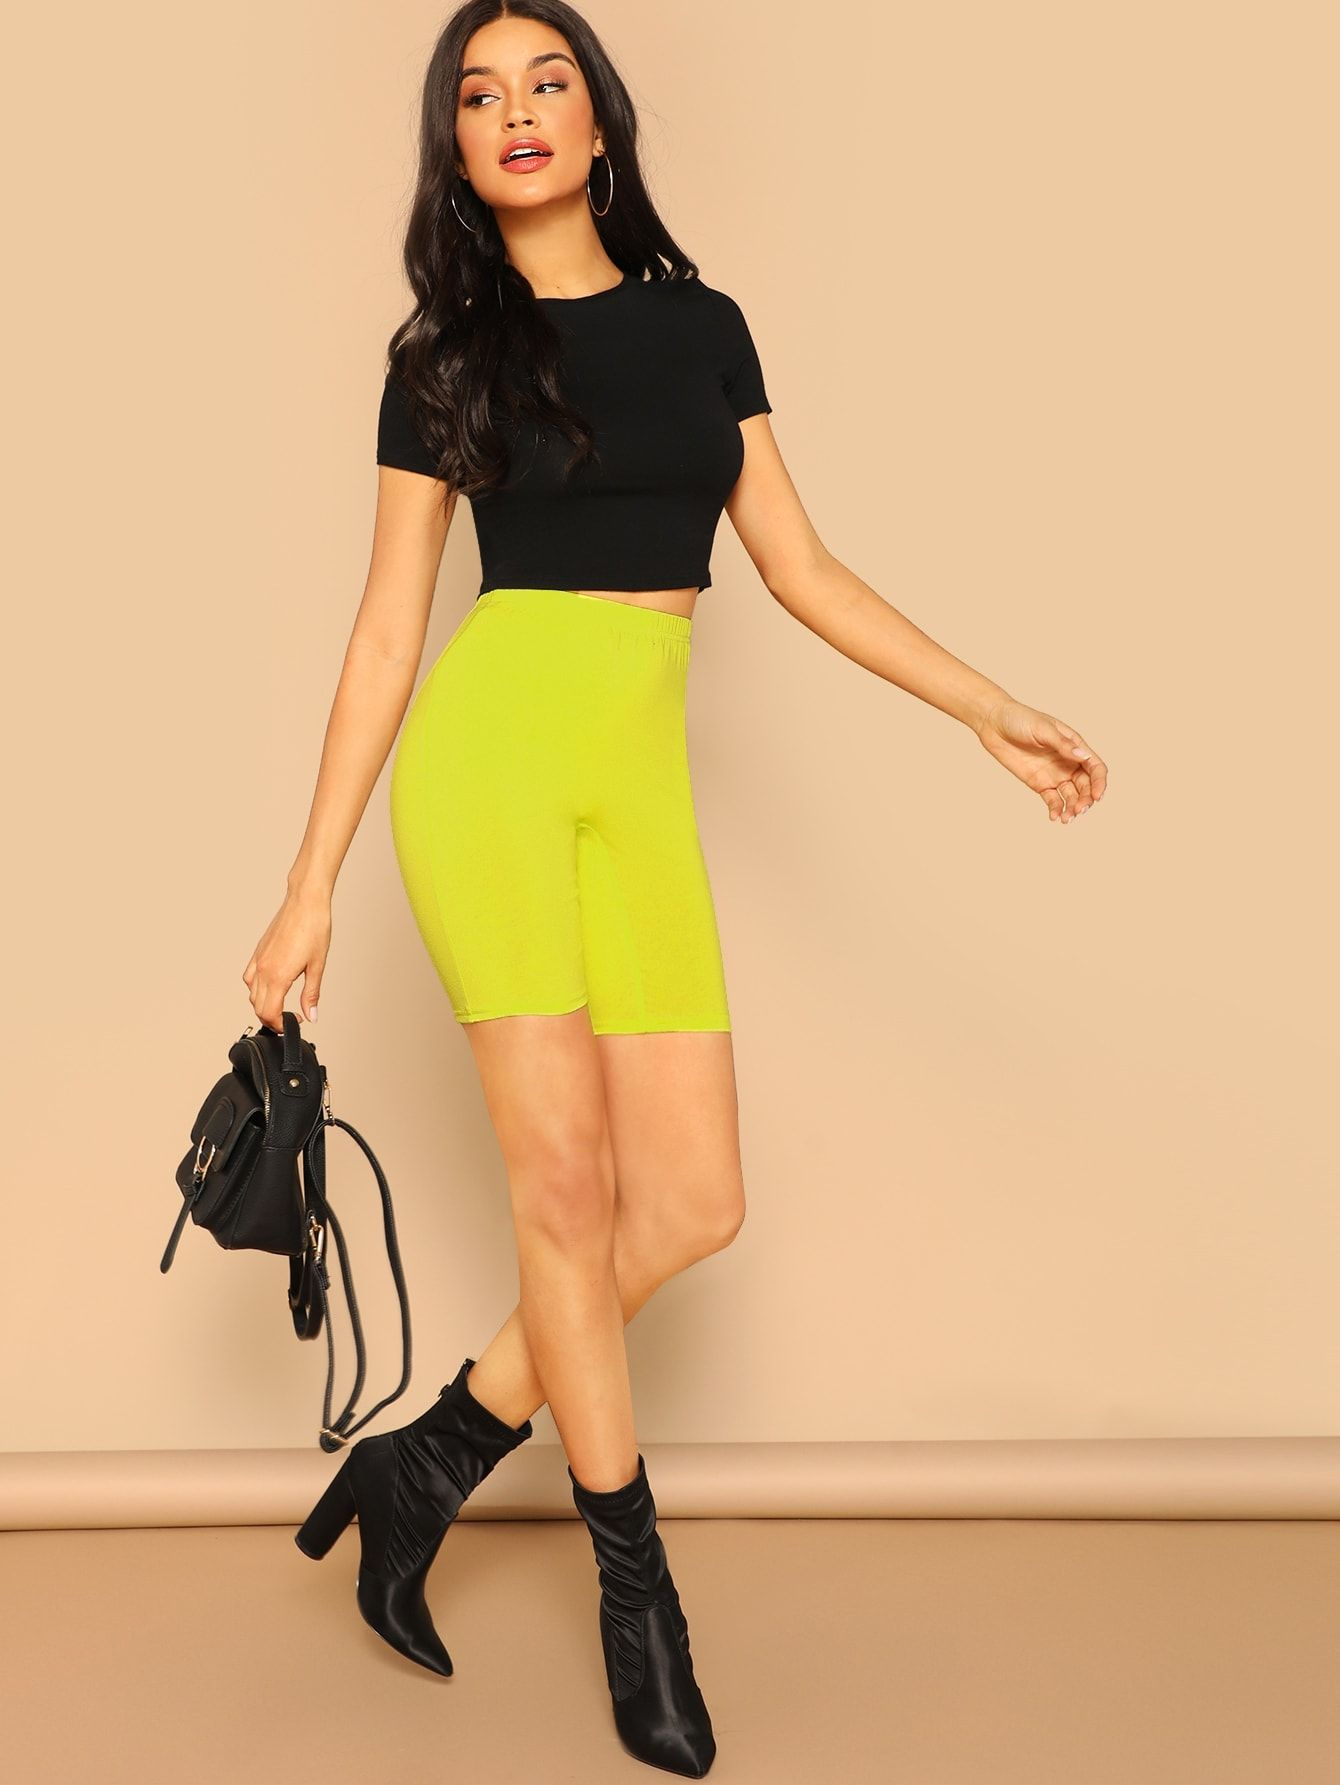 2f45a906f6a7 Sporty Regular Plain Yellow Knee Length Neon Yellow High Waist Leggings  Shorts